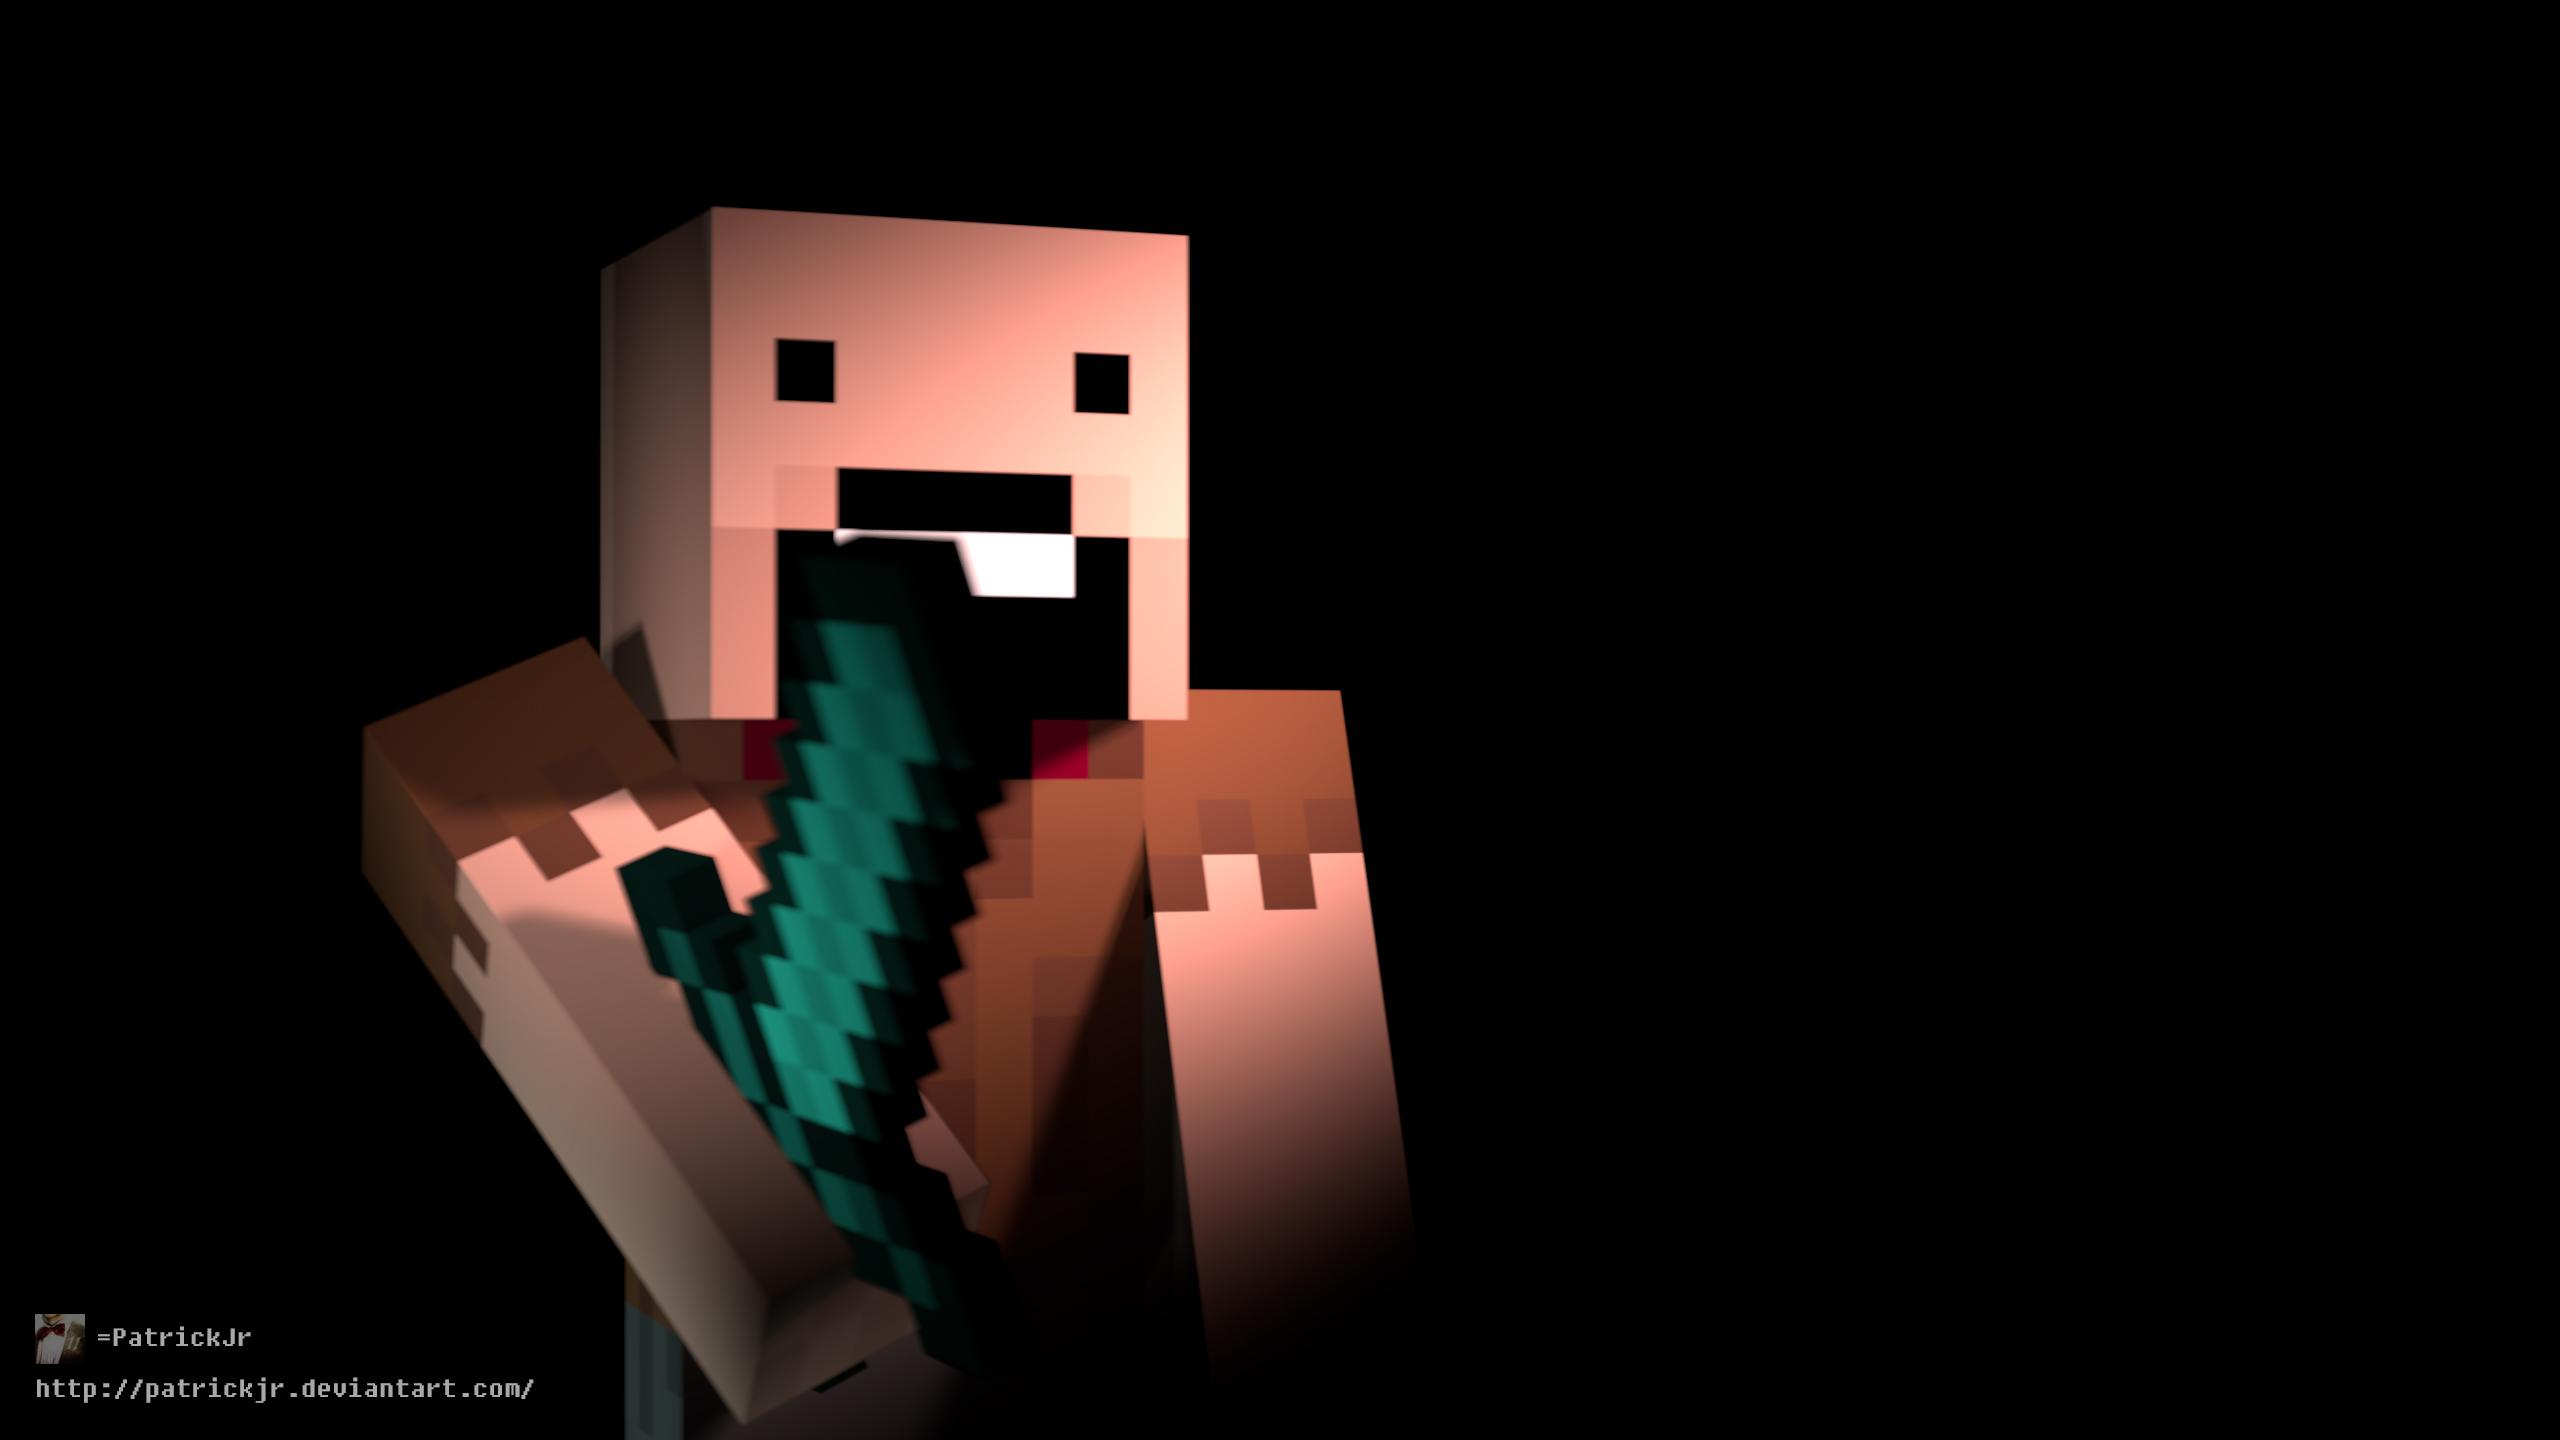 Simple Wallpaper Minecraft Poster - sfm_poster__notch__by_patrickjr-d5dj1ex  Graphic_527293.jpg